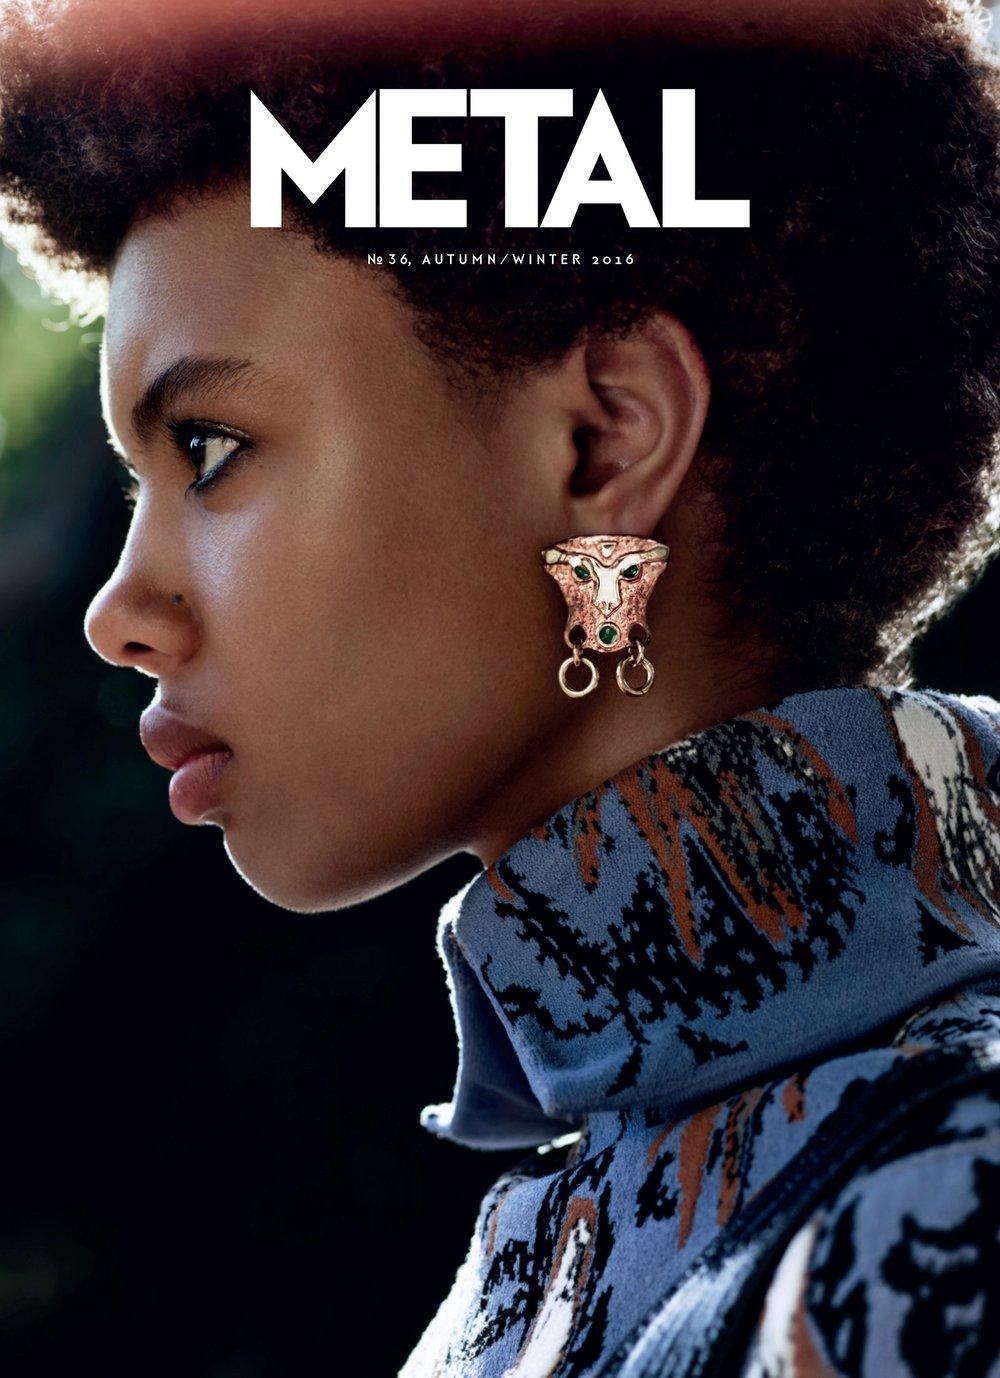 COVER 3 - Poppy Okotcha by Billy Ballard wearing Dior